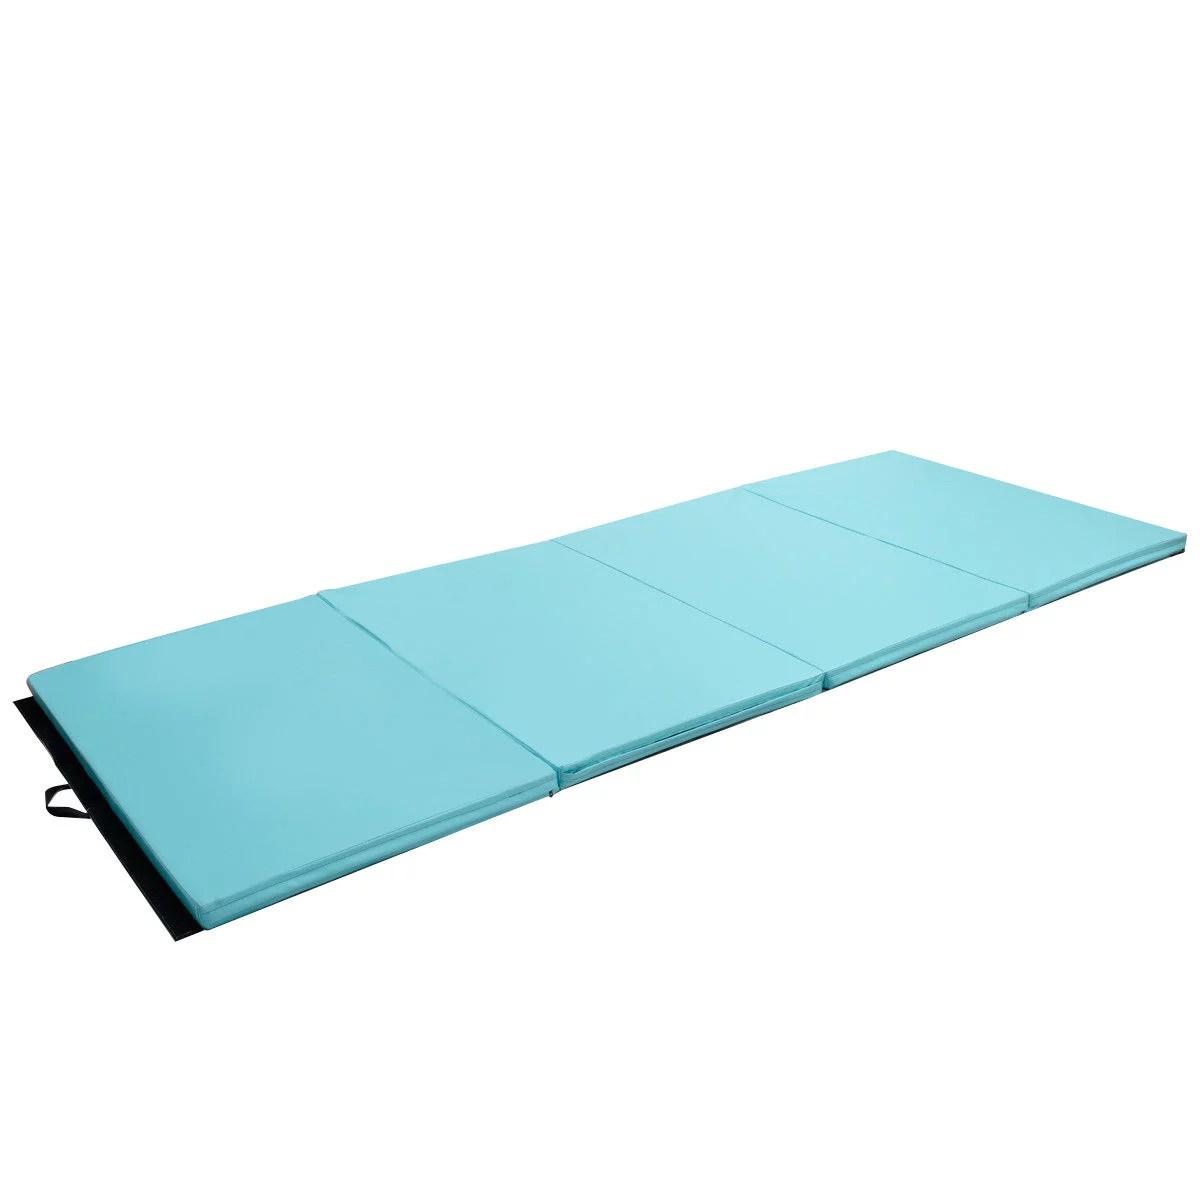 4 X10 X2 Gymnastics Mat Thick Folding Panel Aerobics